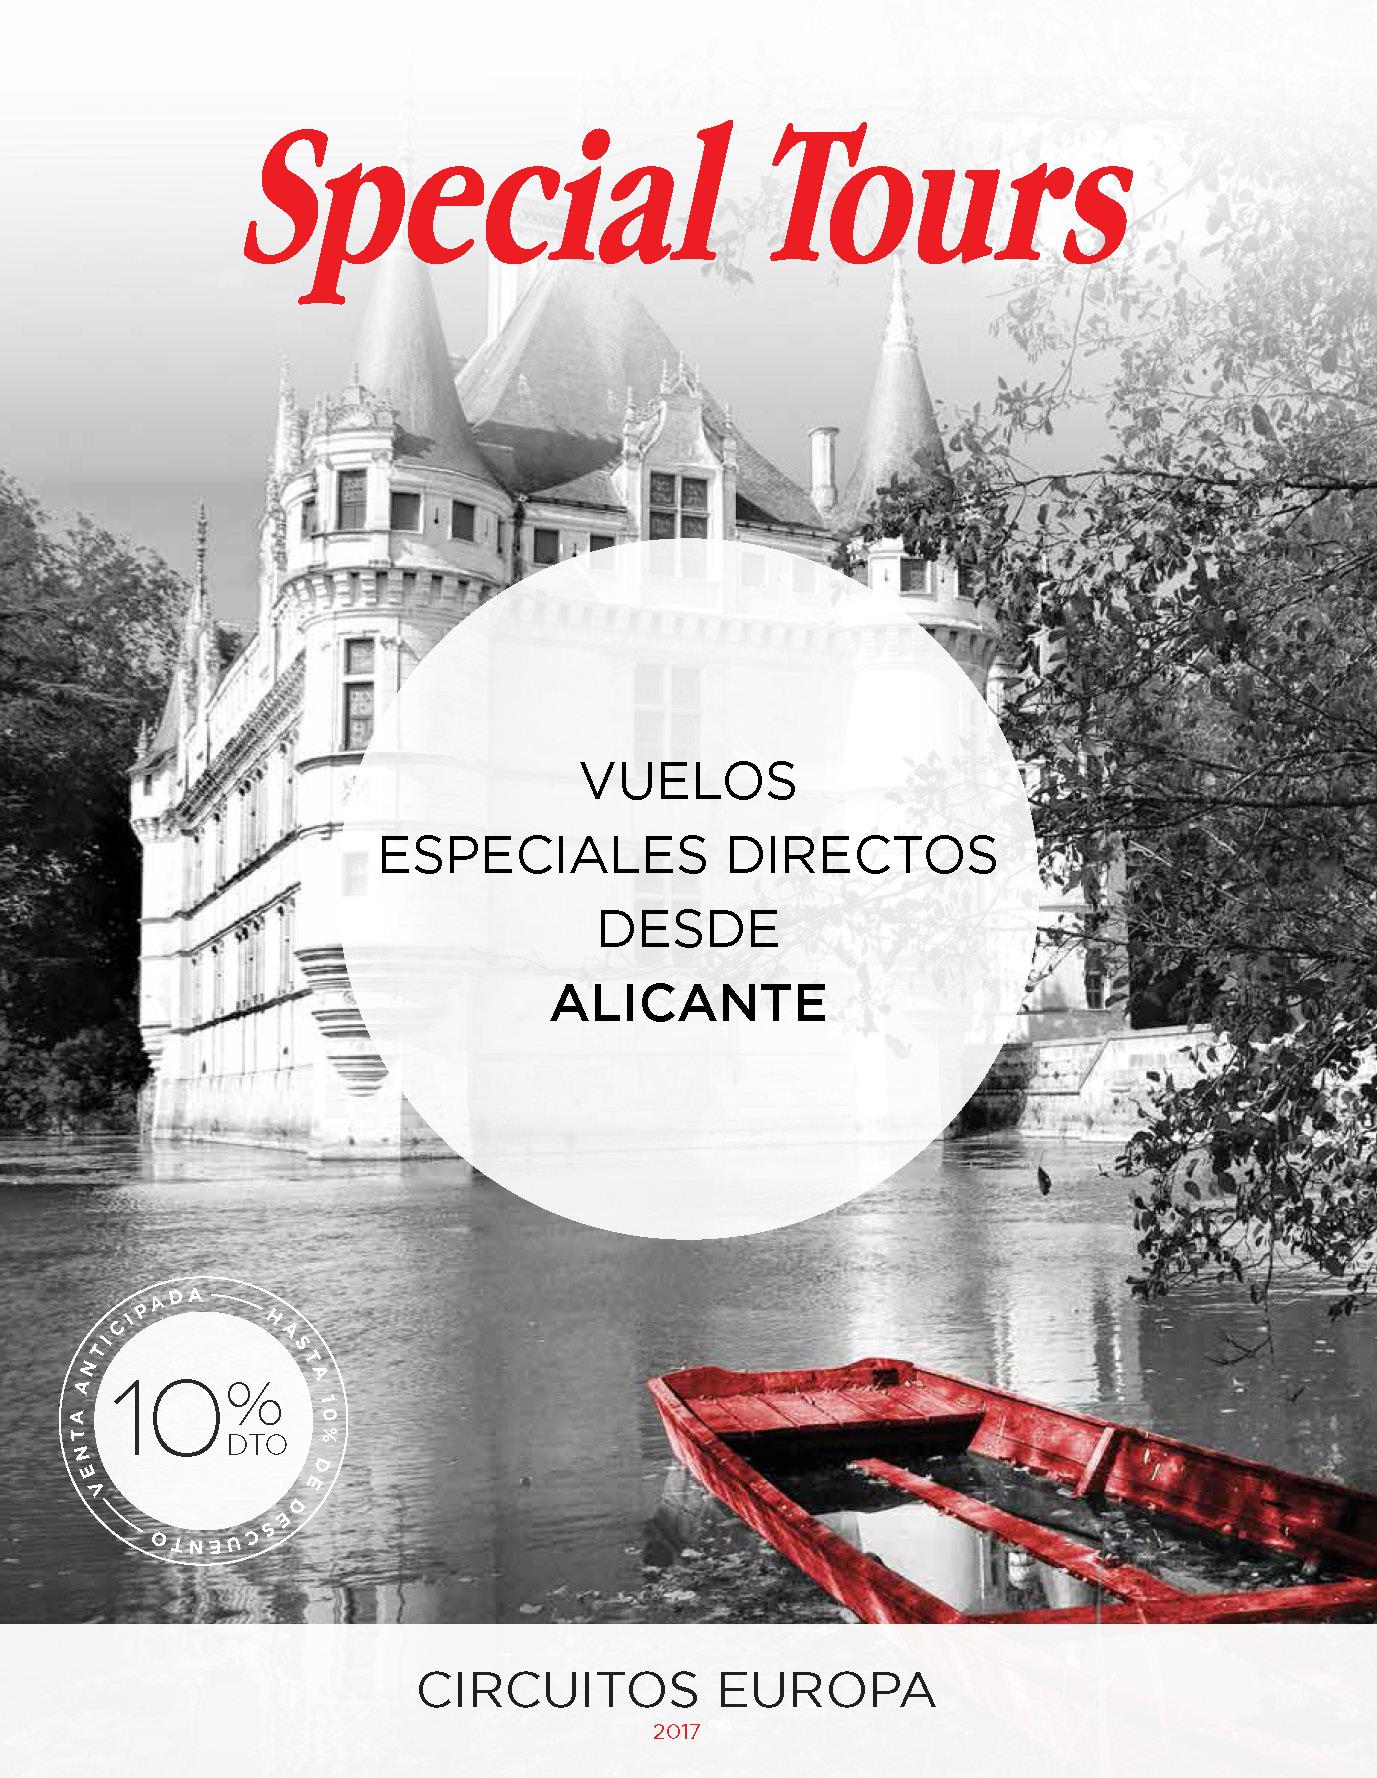 Folleto Special Tours Verano 2017 salidas vuelo directo desde Alicante